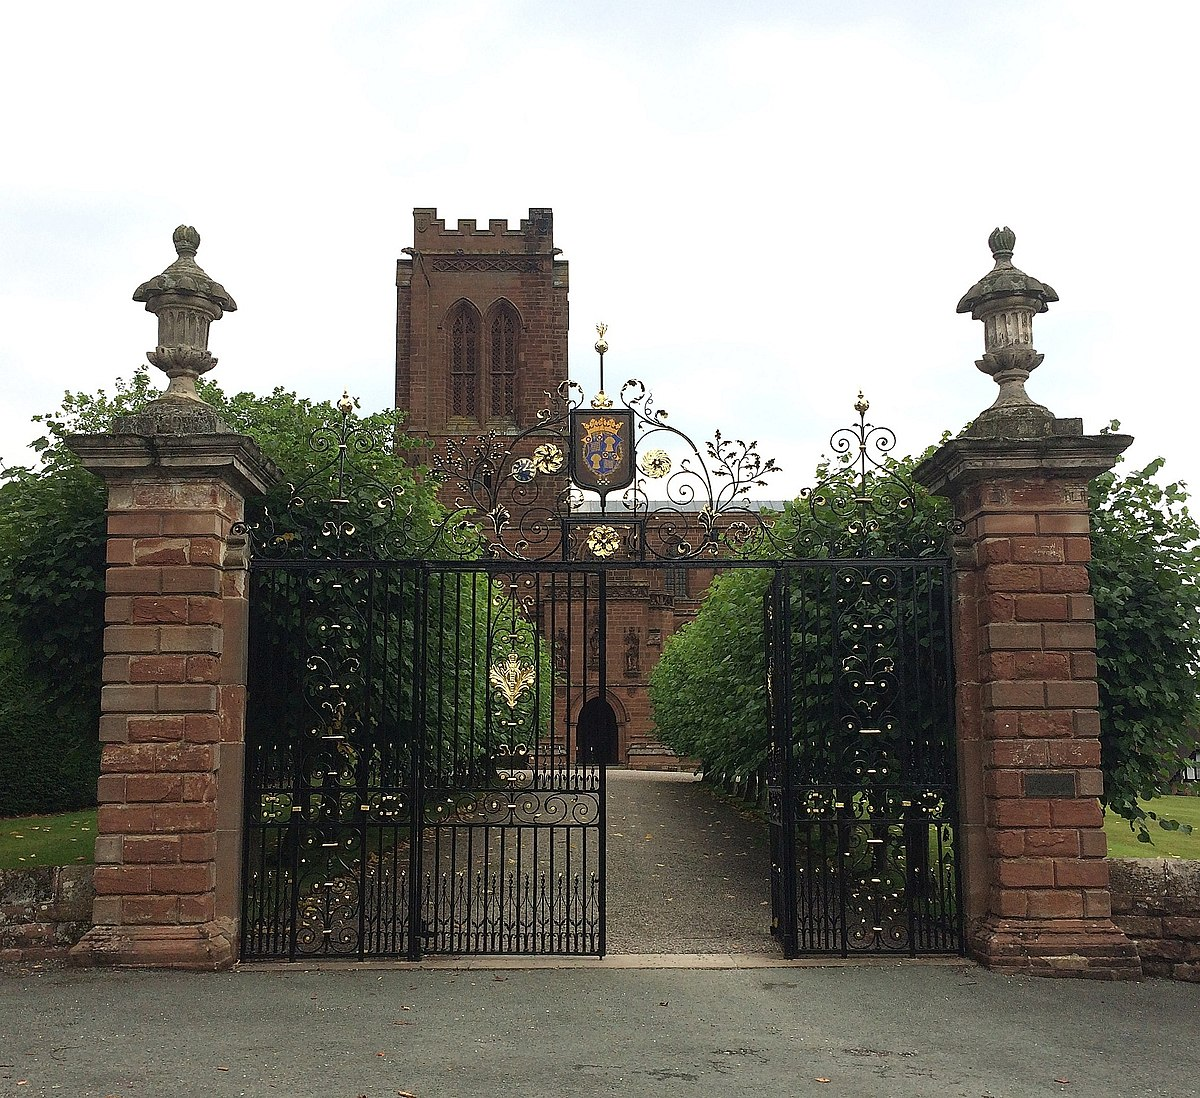 Gates of St Mary's Church, Eccleston, Cheshire 2.JPG